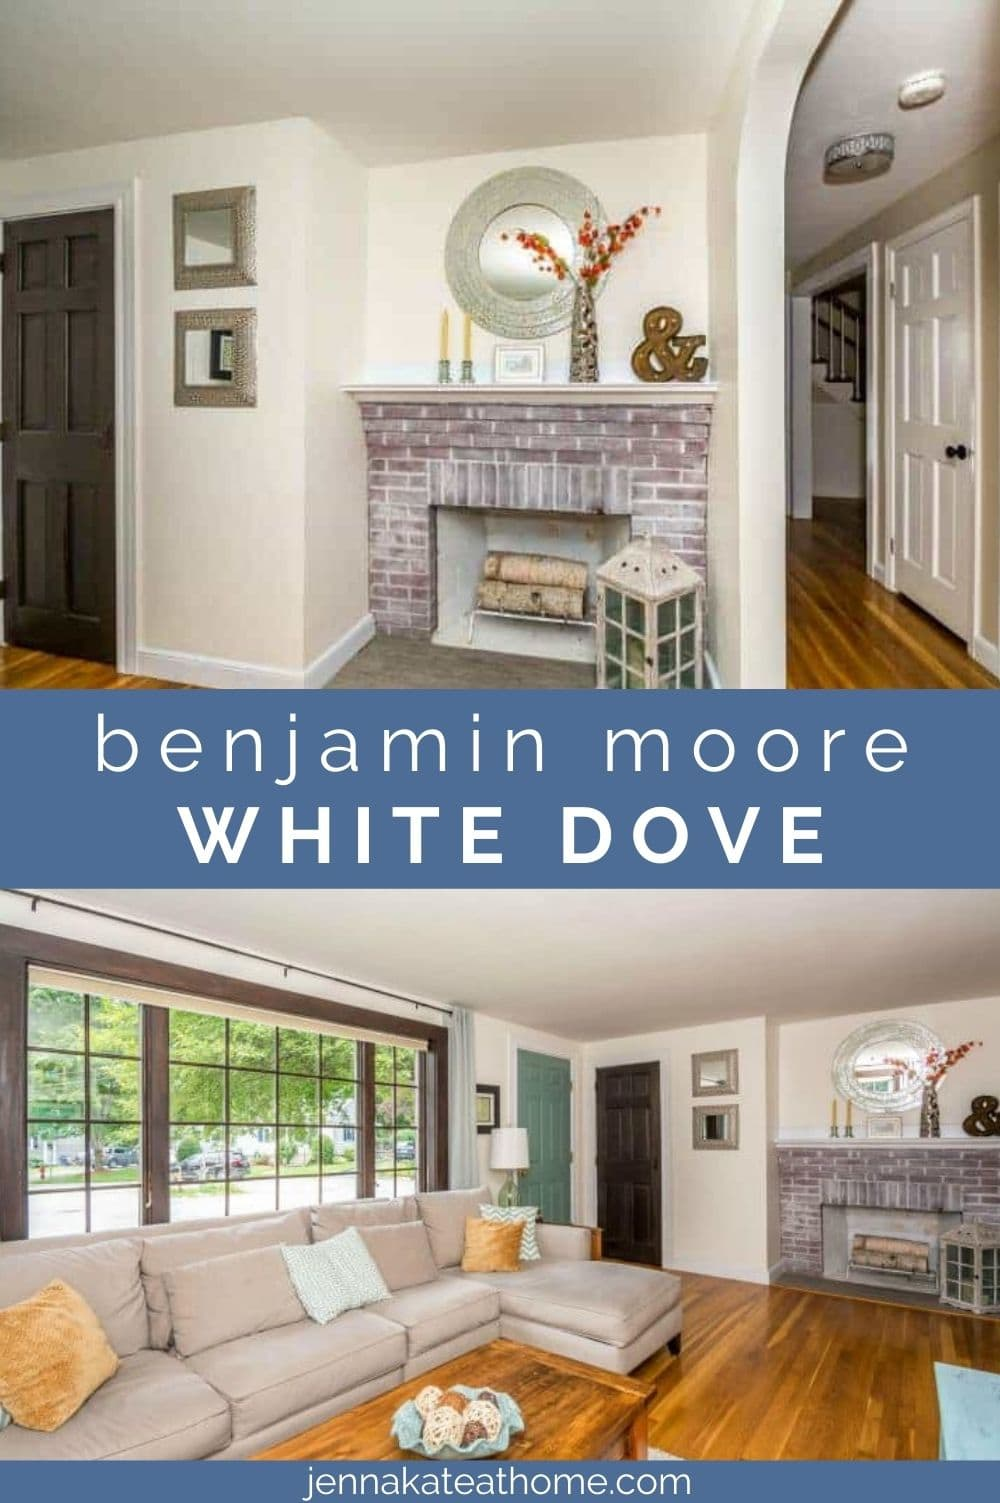 Benjamin Moore White Dove pin image